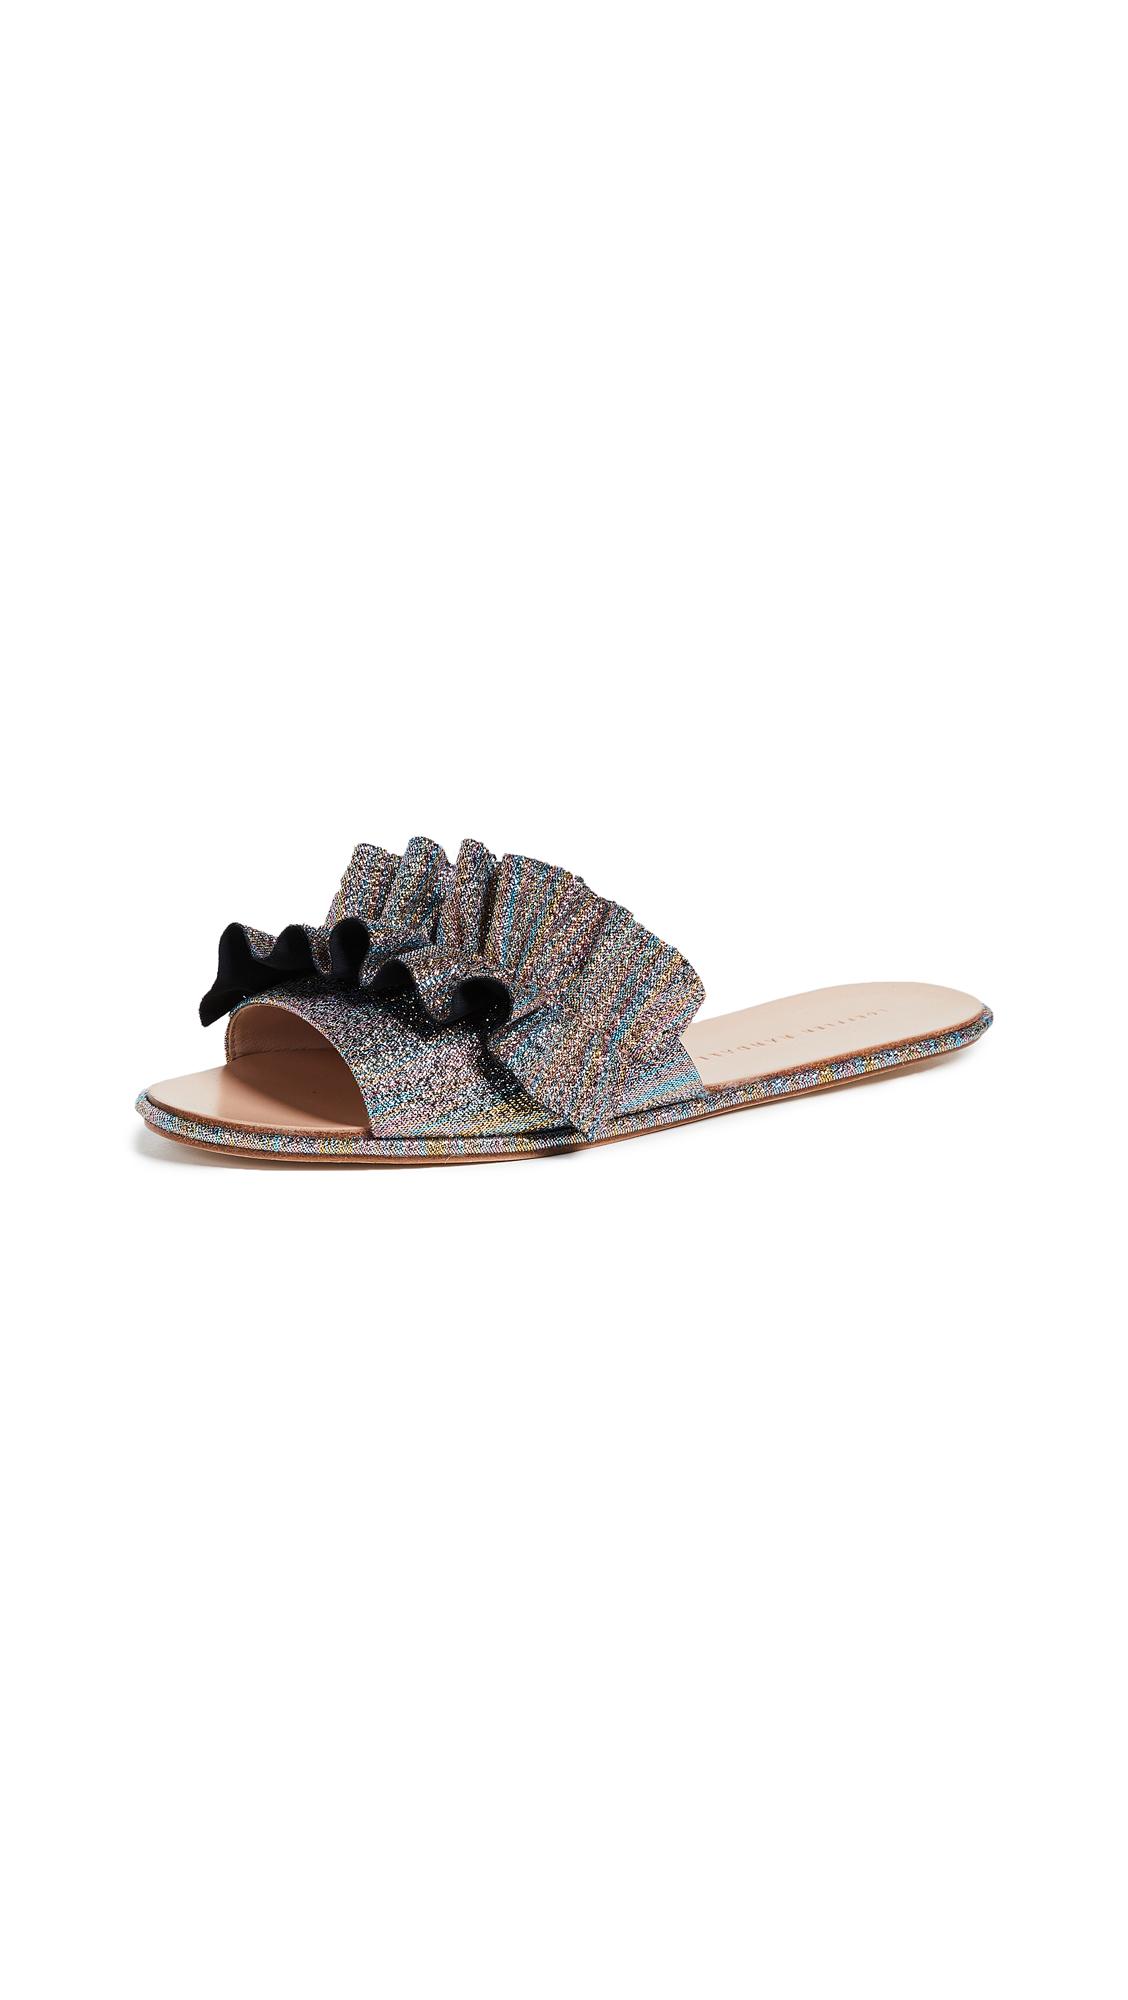 Loeffler Randall Rey Ruffle Slides